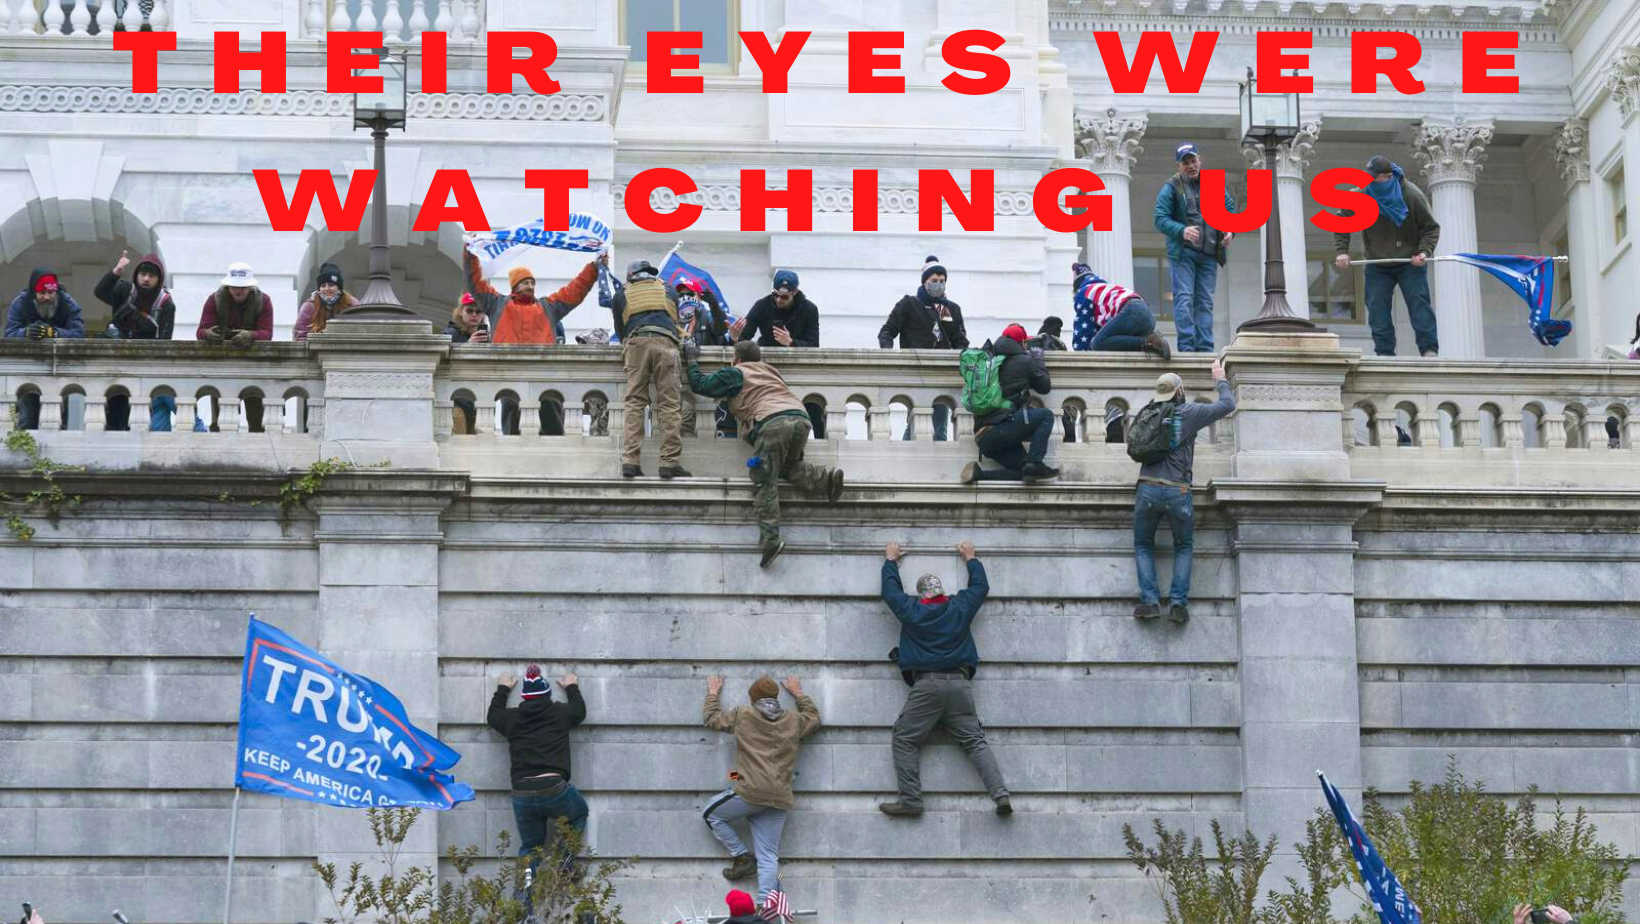 their eyes were watching us